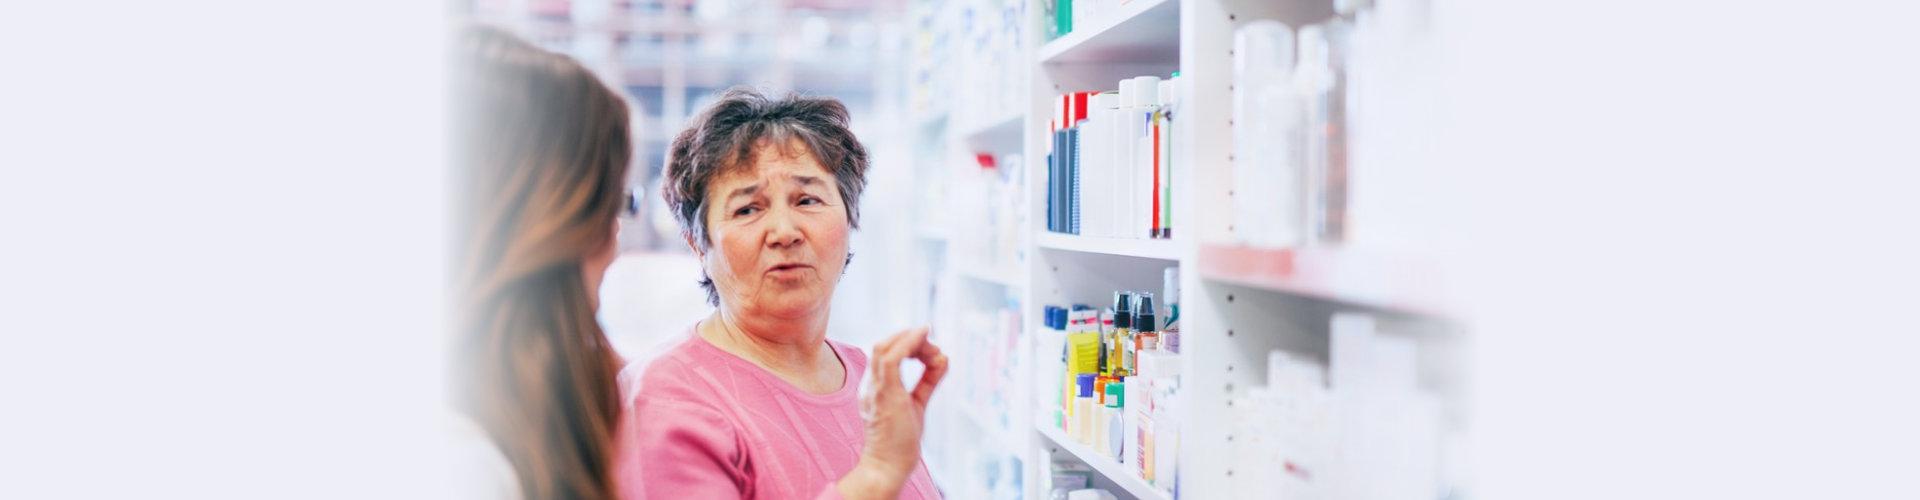 pharmacist discusses medication assortment with senior customer